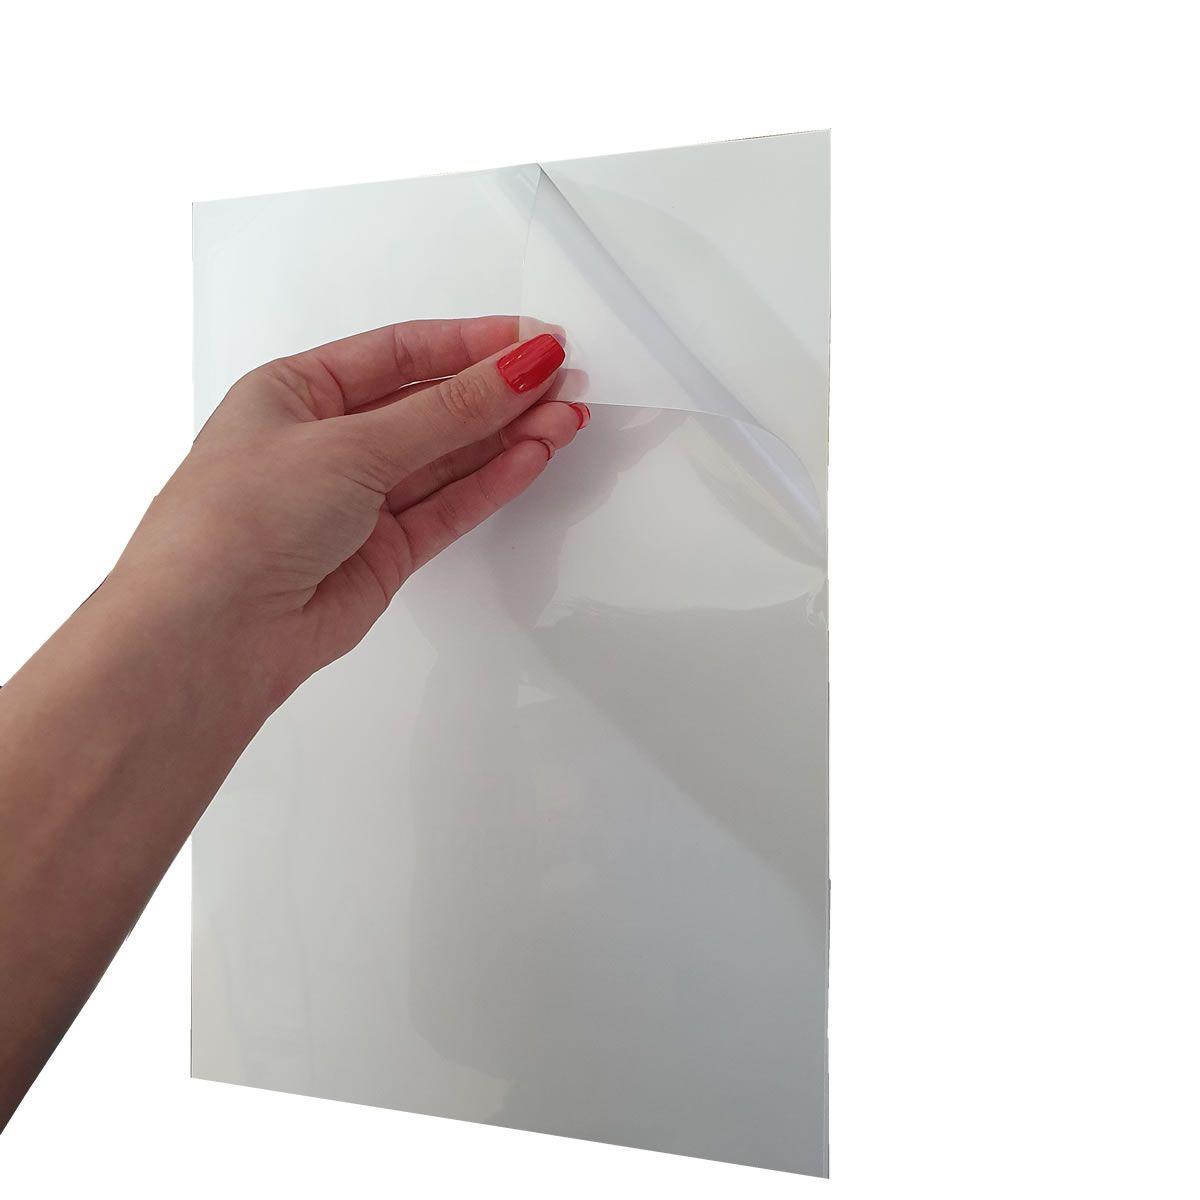 60 Folhas Papel Adesivo Vinil Transparente para Jato de Tinta Inkjet 115g 20fls Evolut